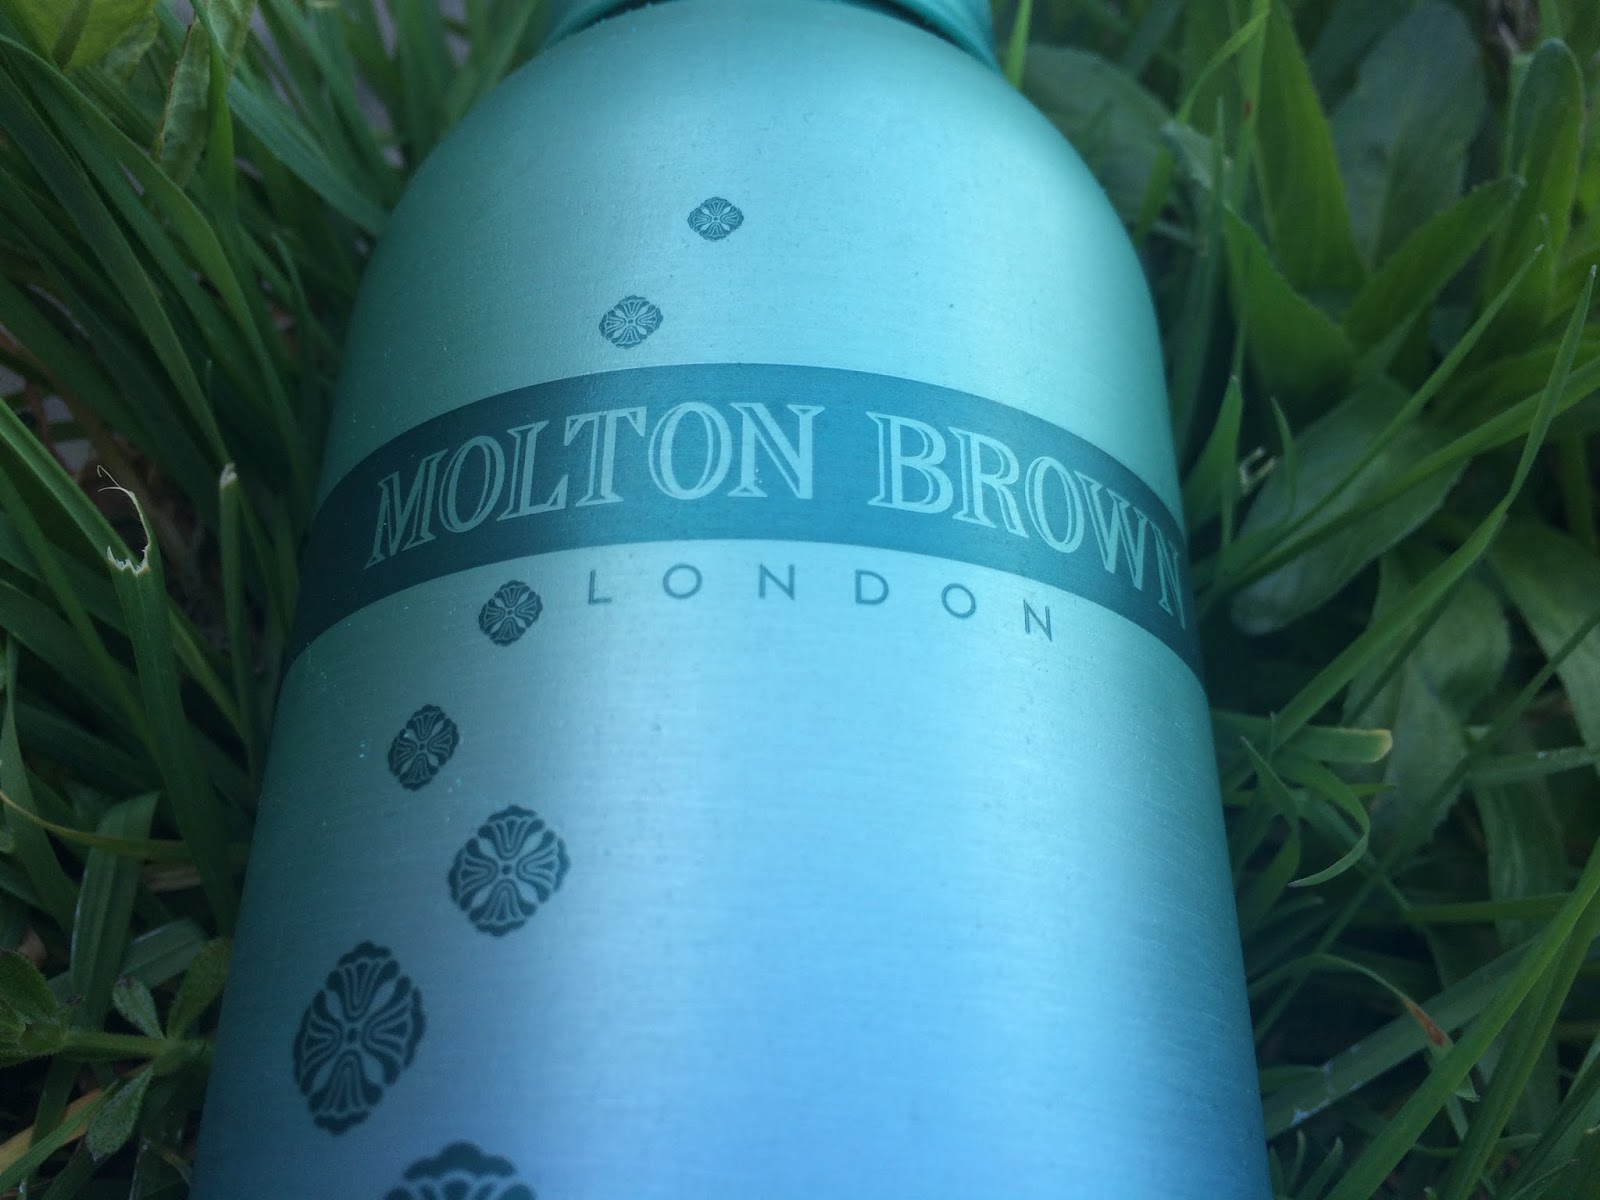 Molton Brown Seamoss Stress-relieving Hydrosoak